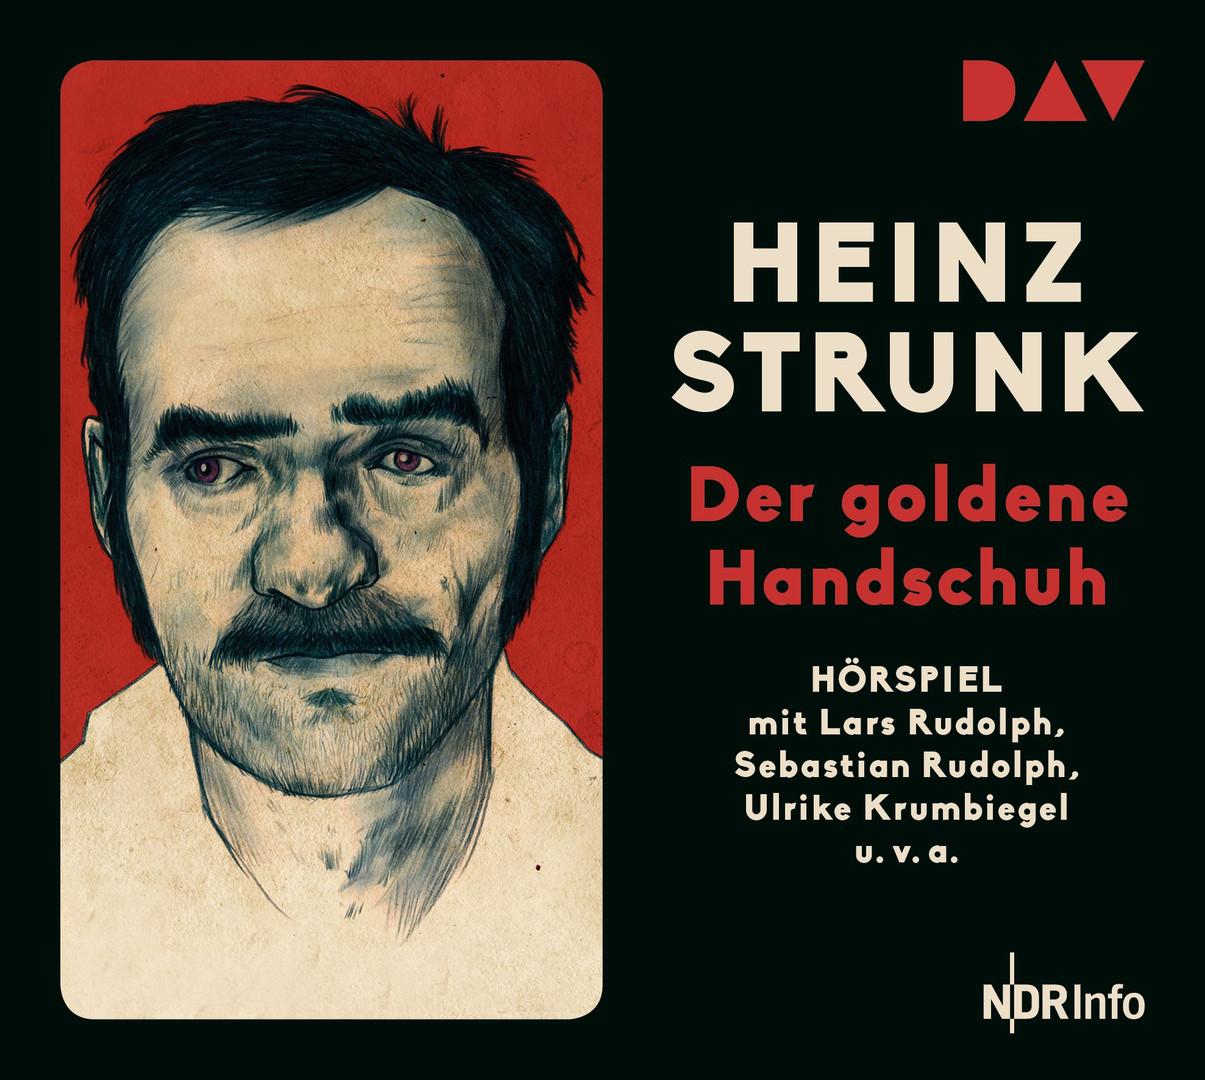 Heinz Strunk - Der goldene Handschuhandschuh (NDR Hörspiel)